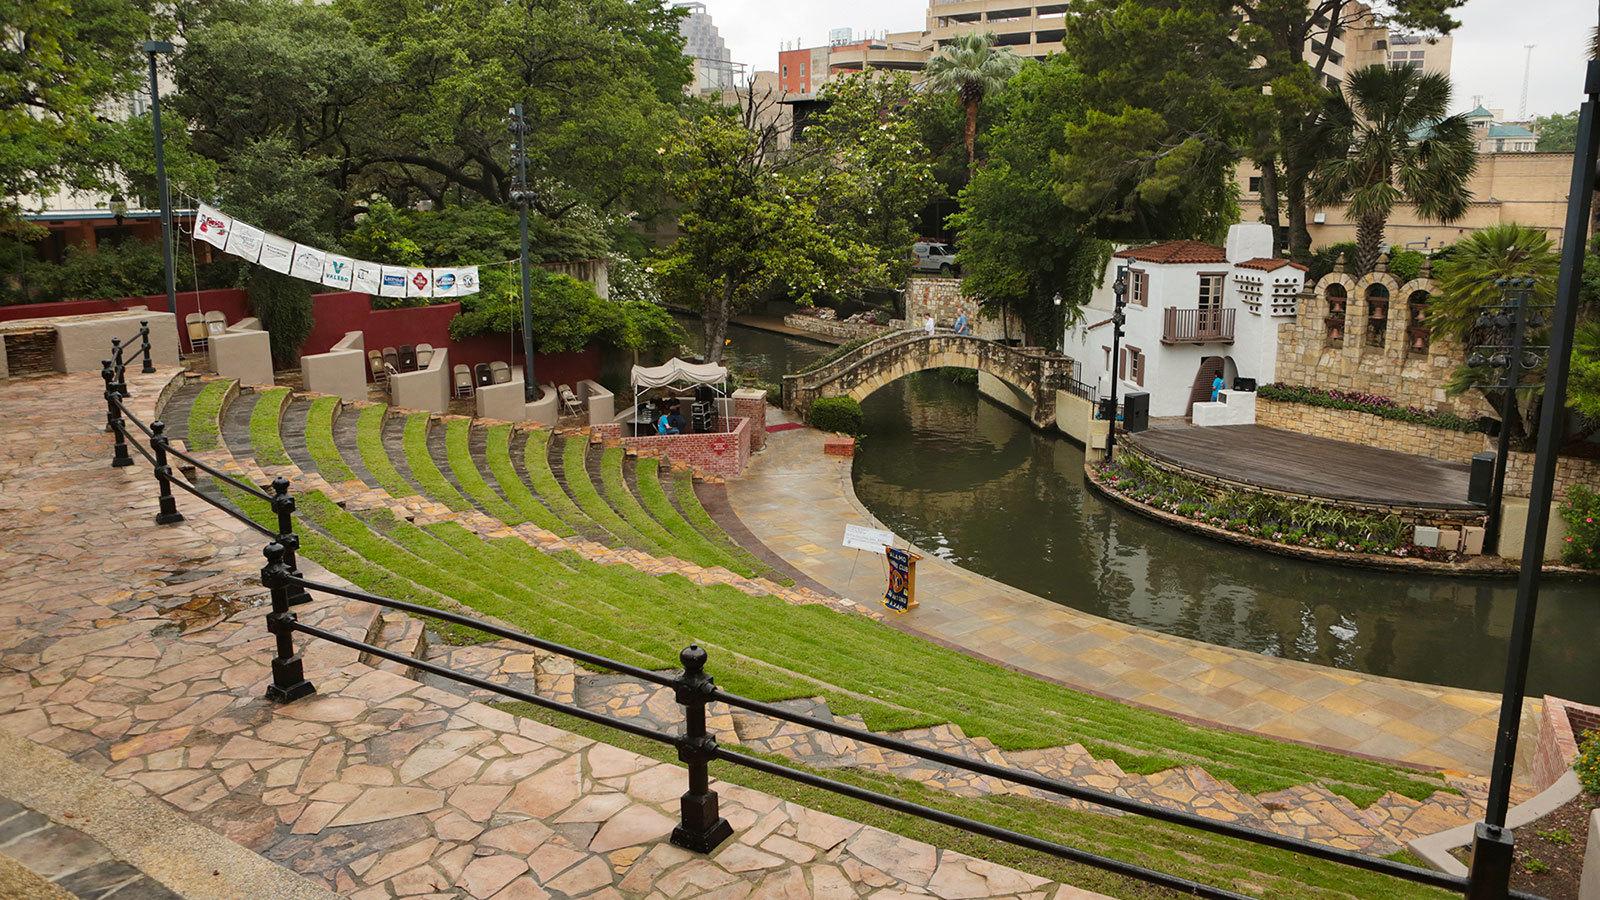 San Antonio River Walk | WTTW Chicago Public Media - Television and ...